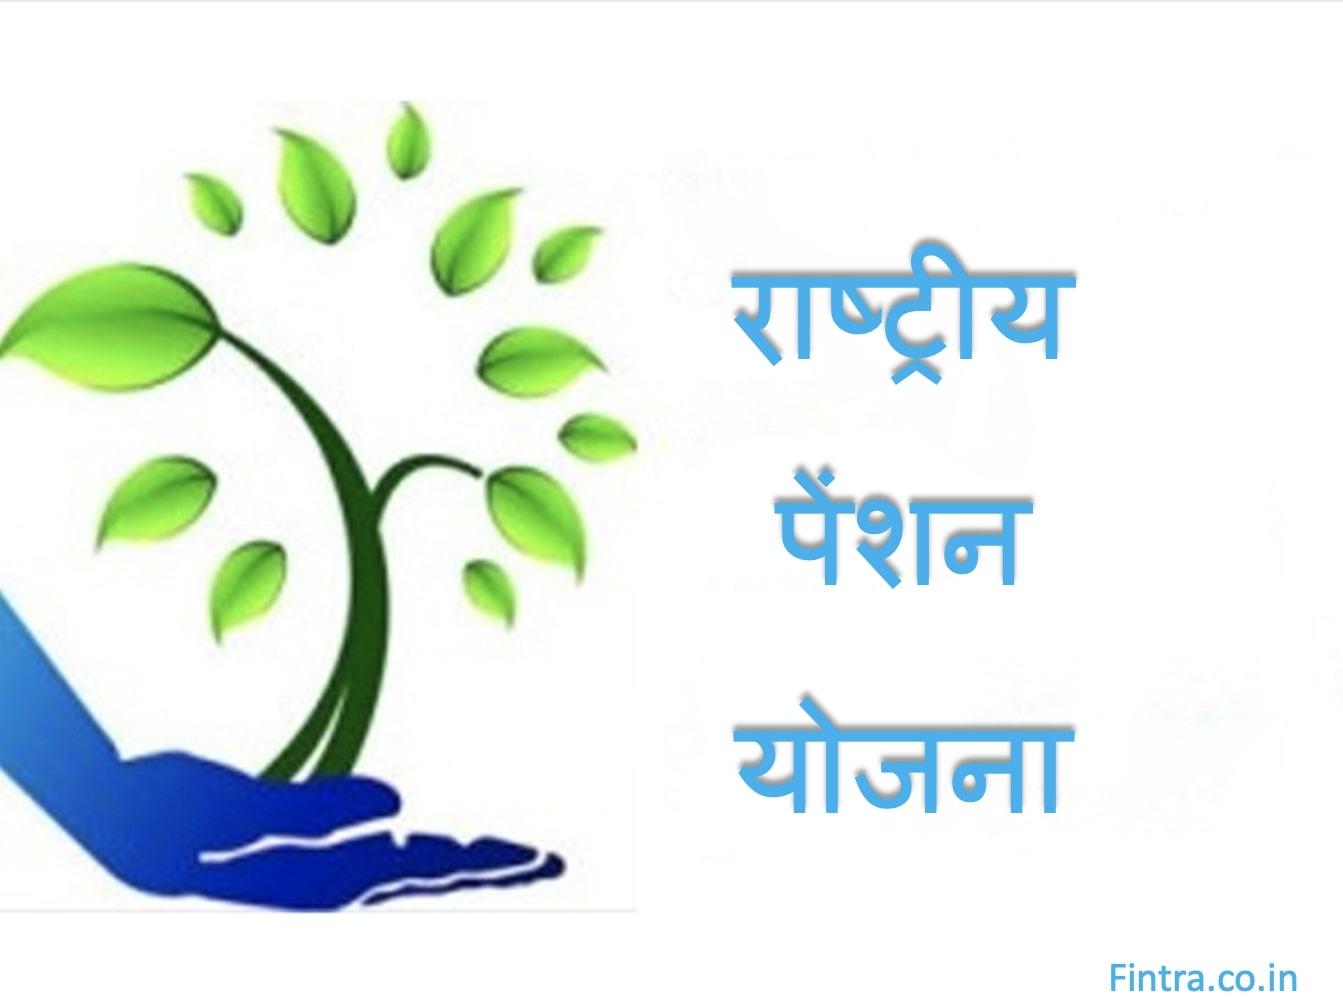 राष्ट्रीय पेंशन योजना (एनपीएस) - एक भारतीय सरकार द्वारा स्वीकृत पेंशन योजना